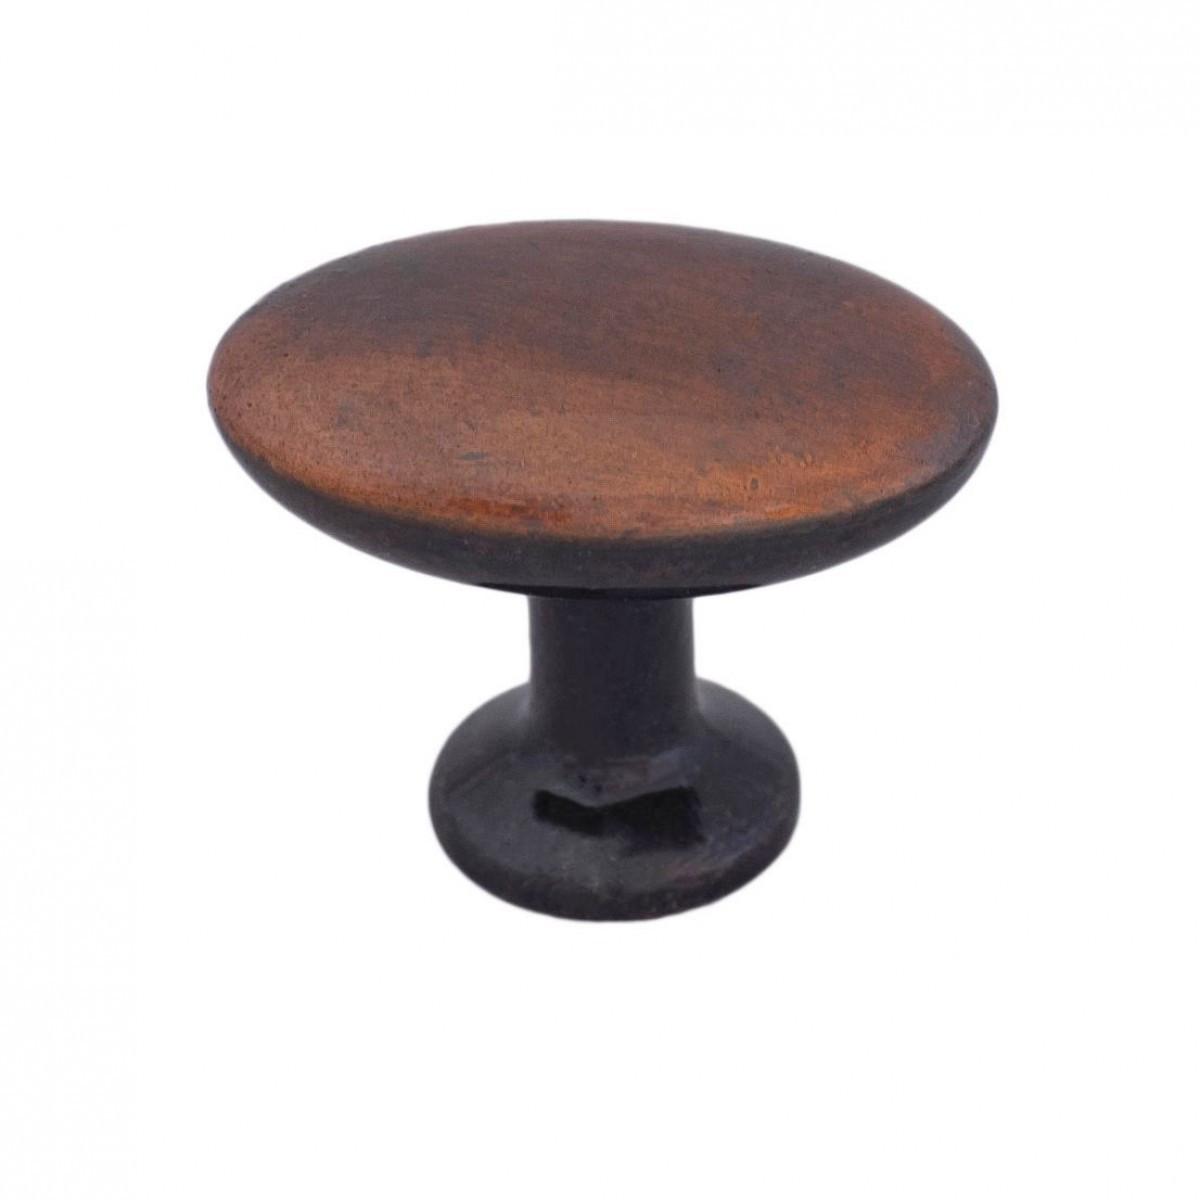 Ручка мебельная Ozkardesler 6054-09 SOMUN DUGME Медь